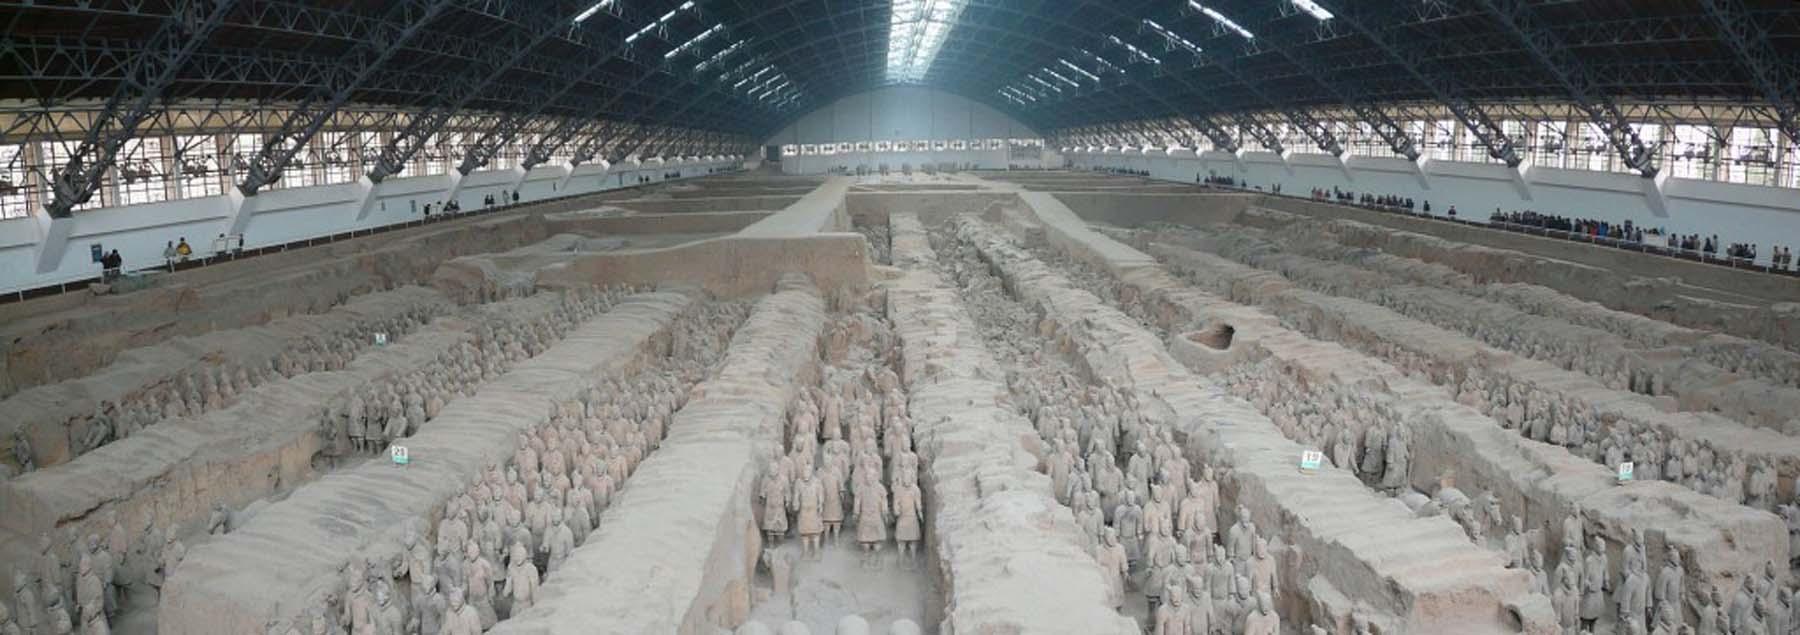 guerreros-terracota-xian